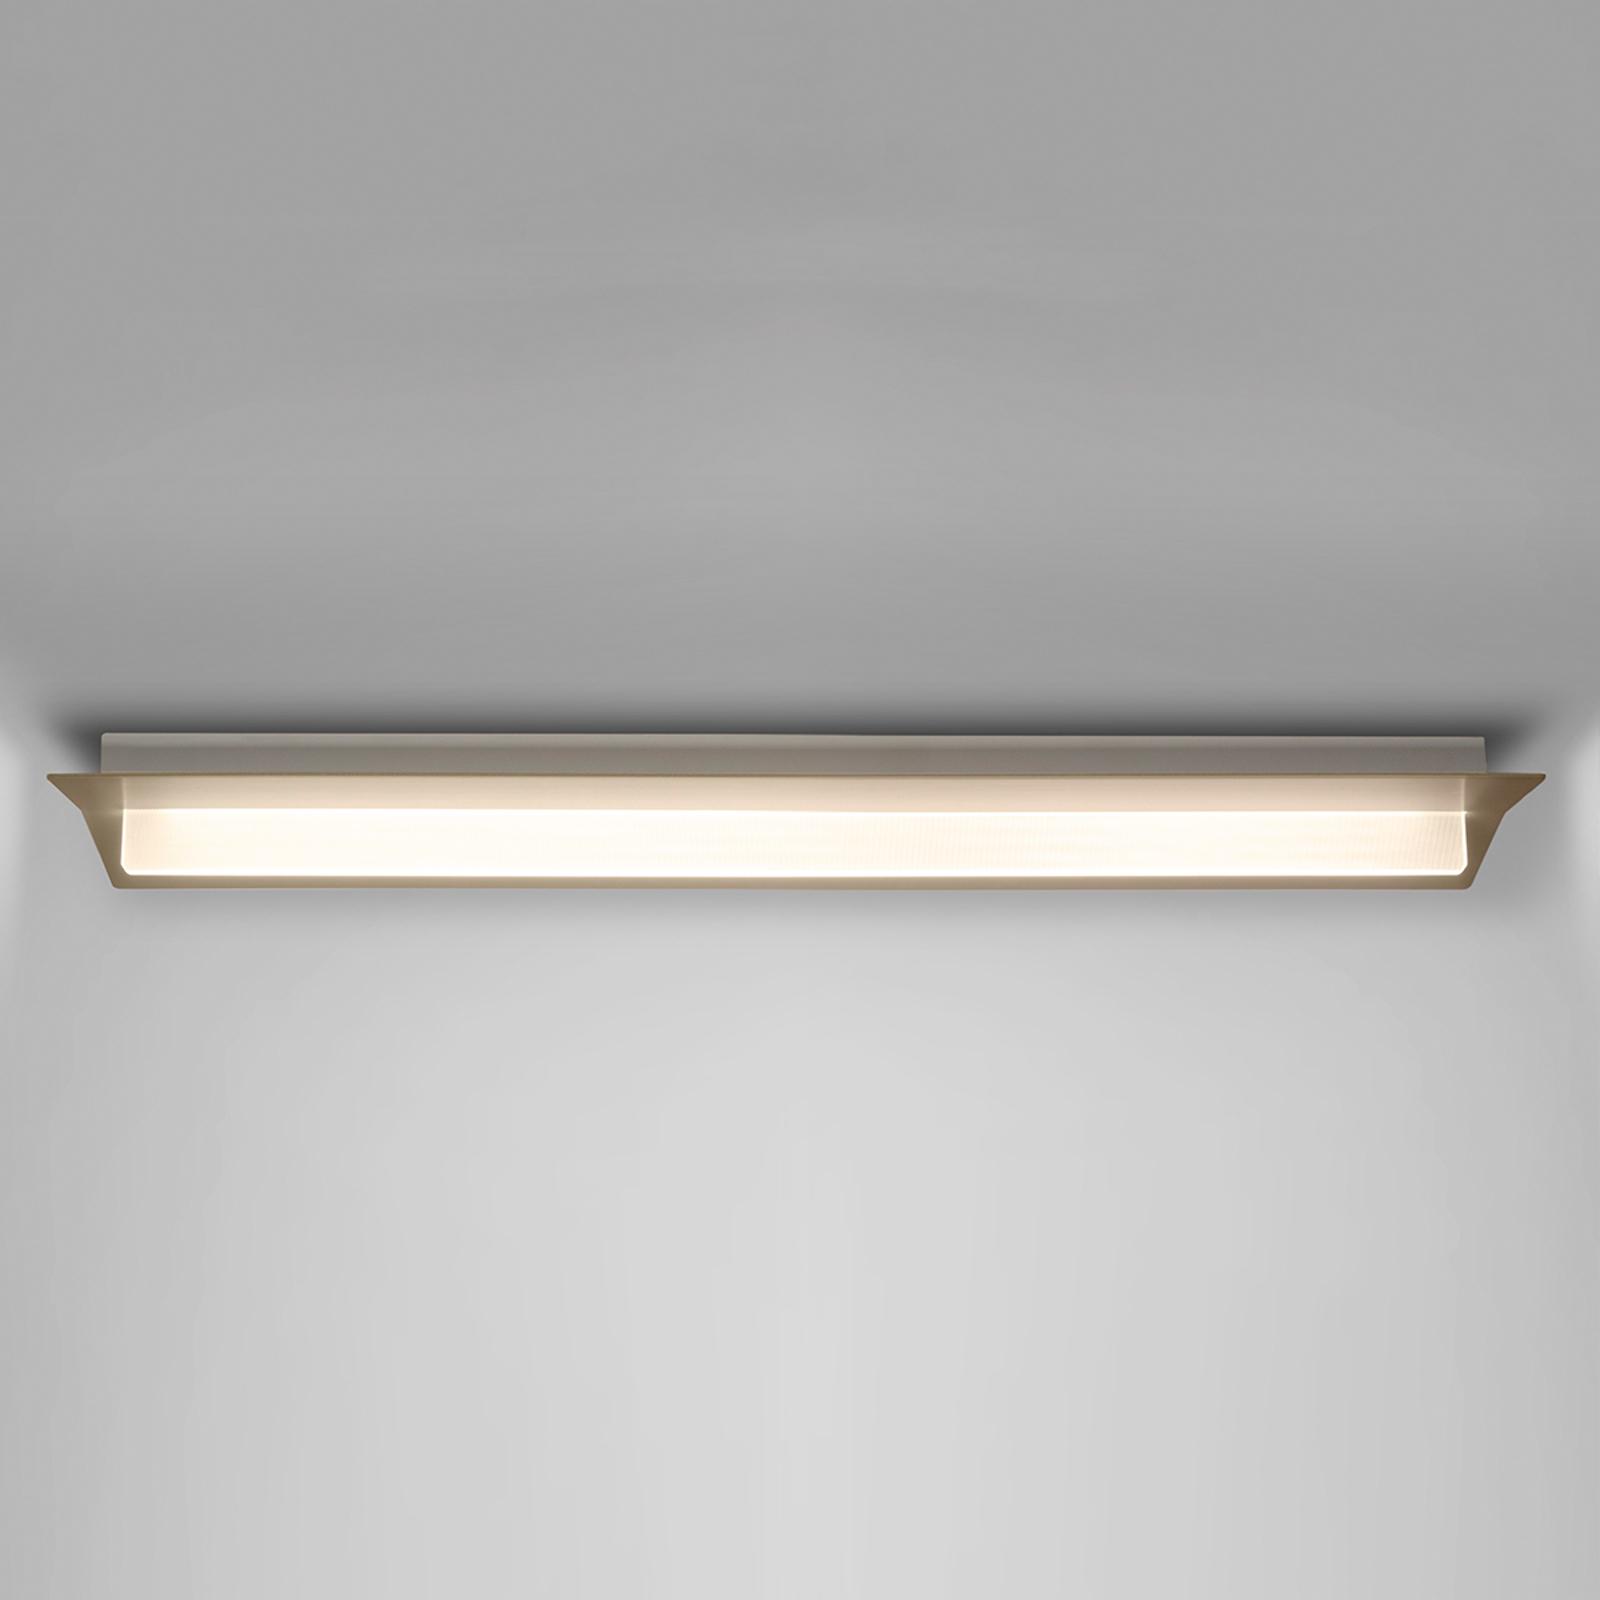 LED-loftlampe Flurry, 100 cm, bronze